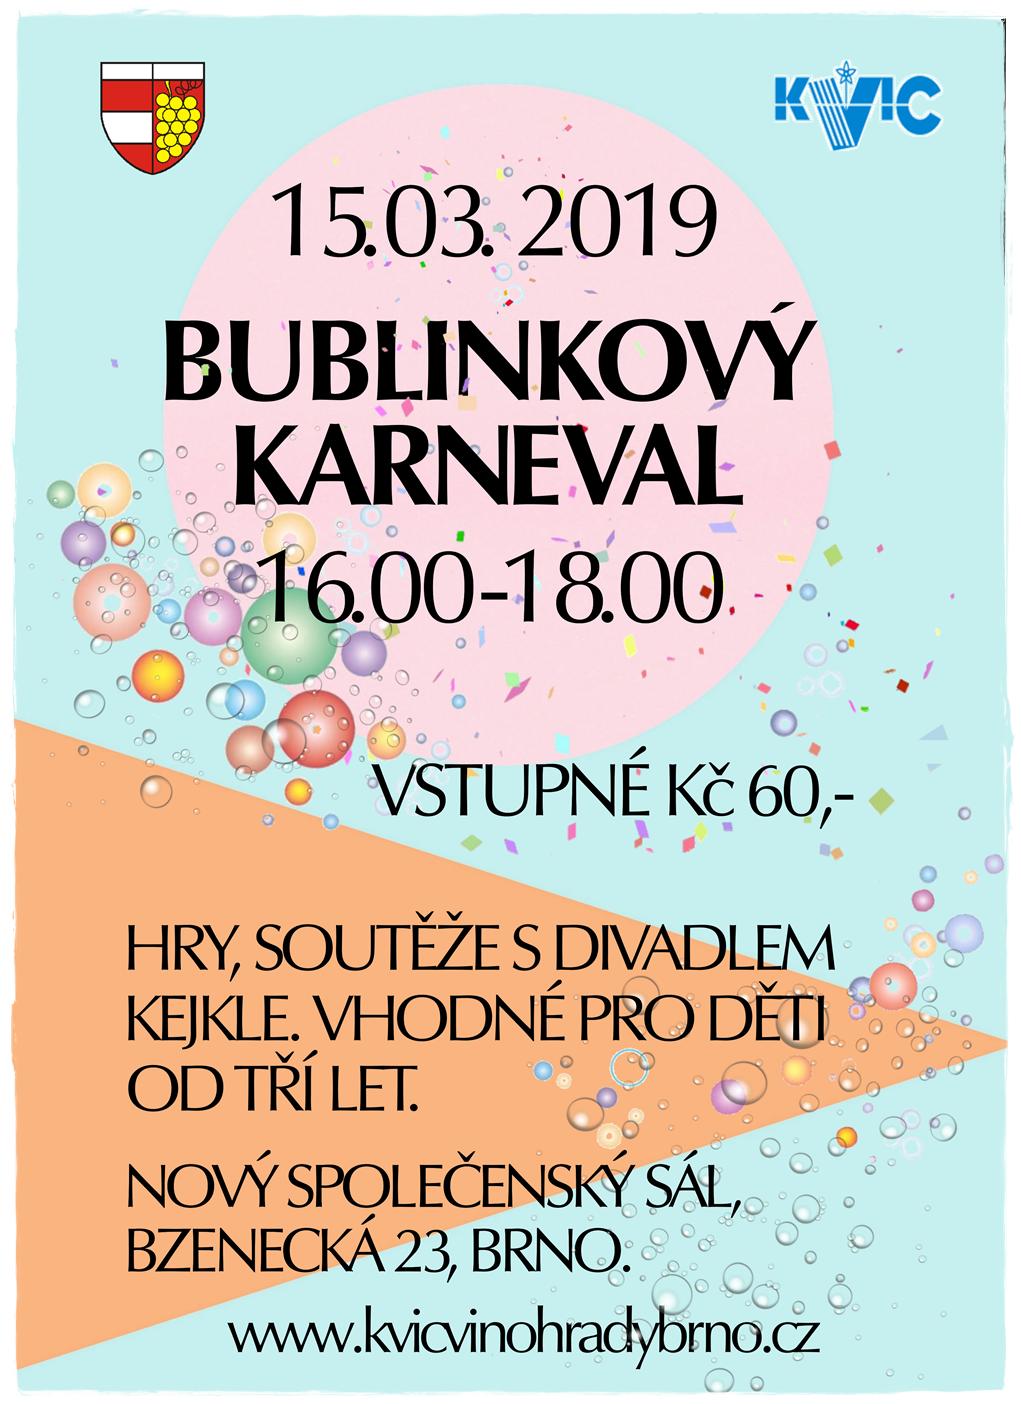 Bublinkový karneval